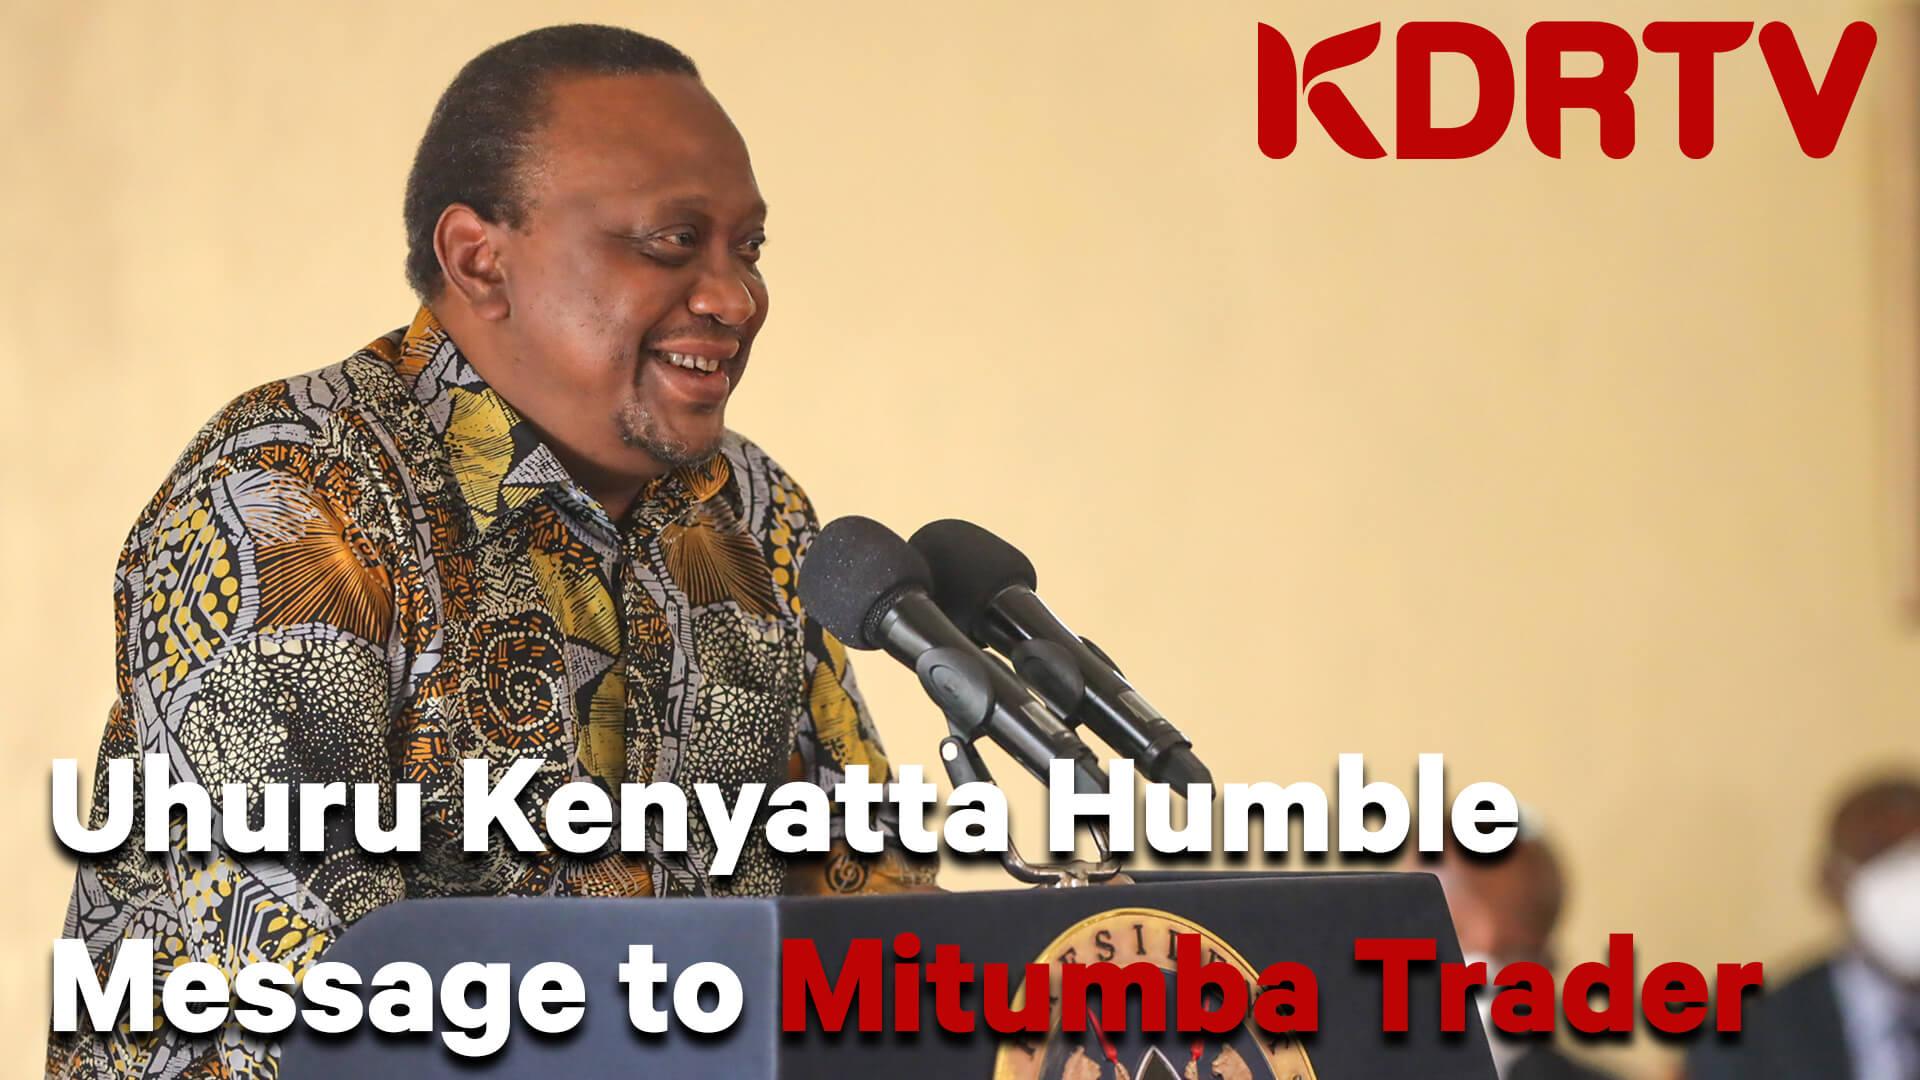 Uhuru rep YT